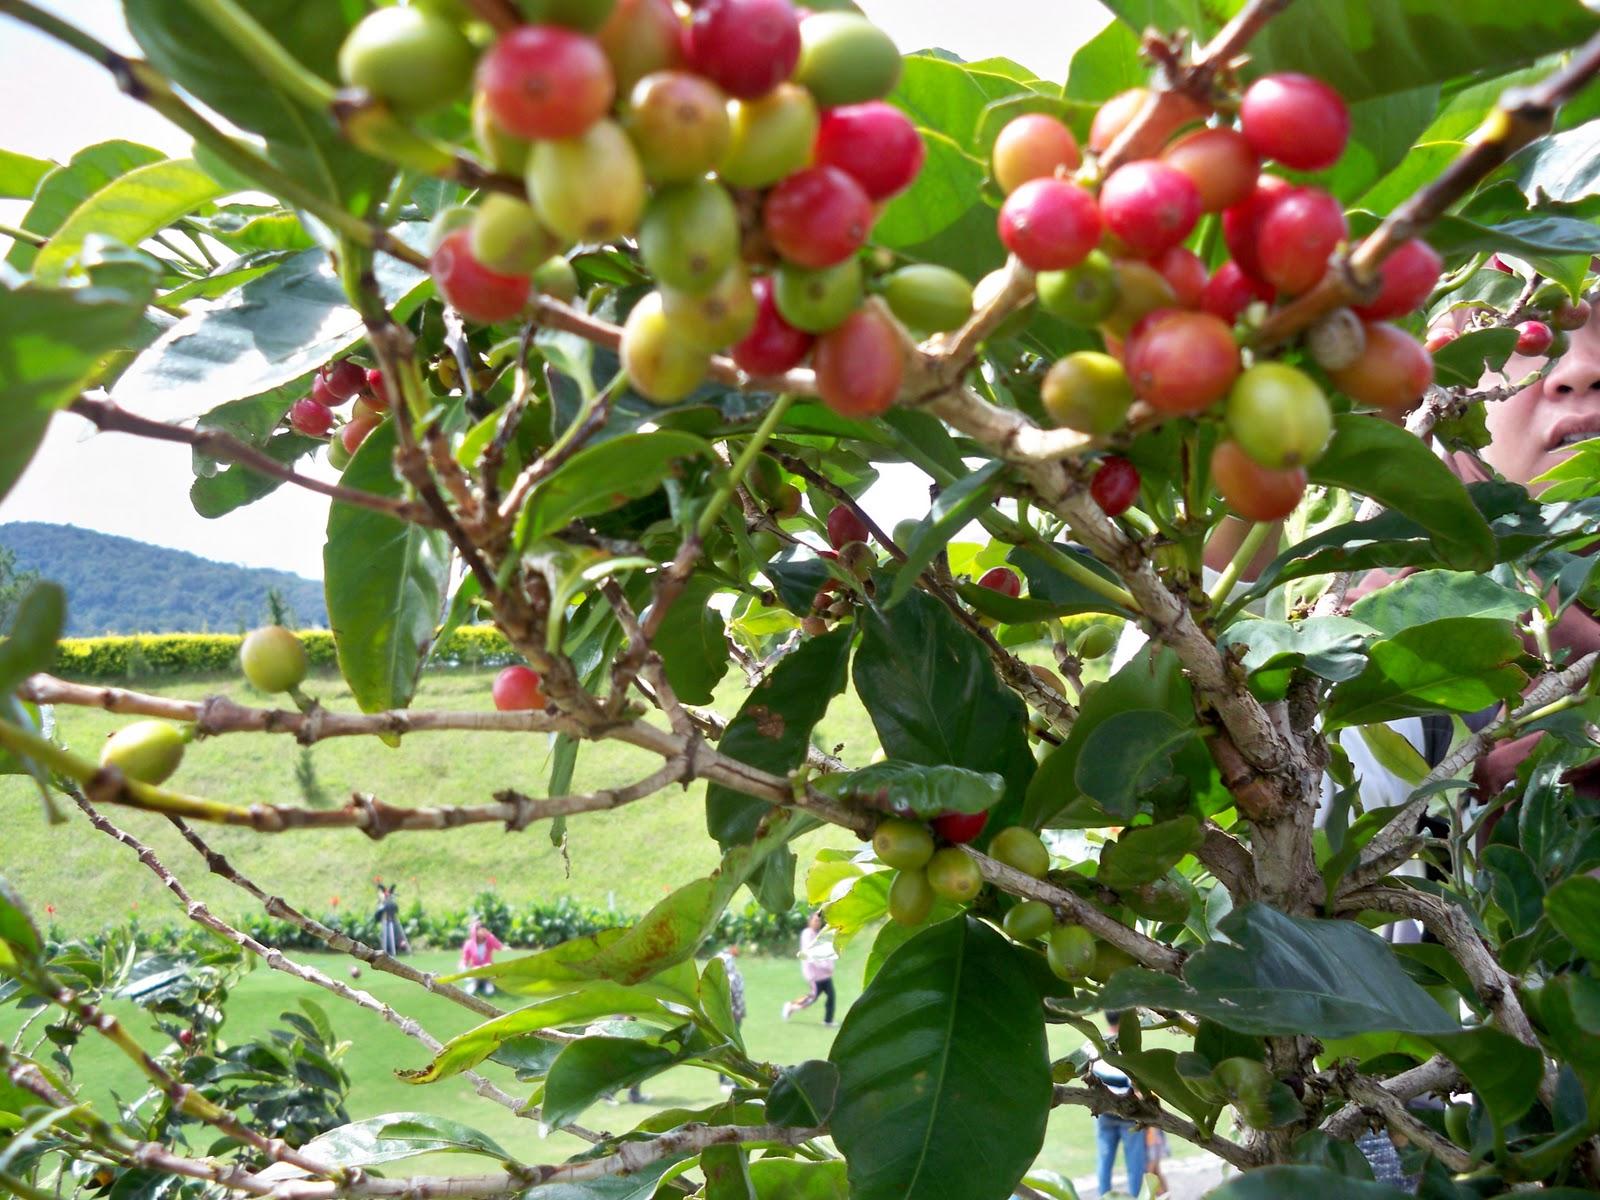 Pohon kopi